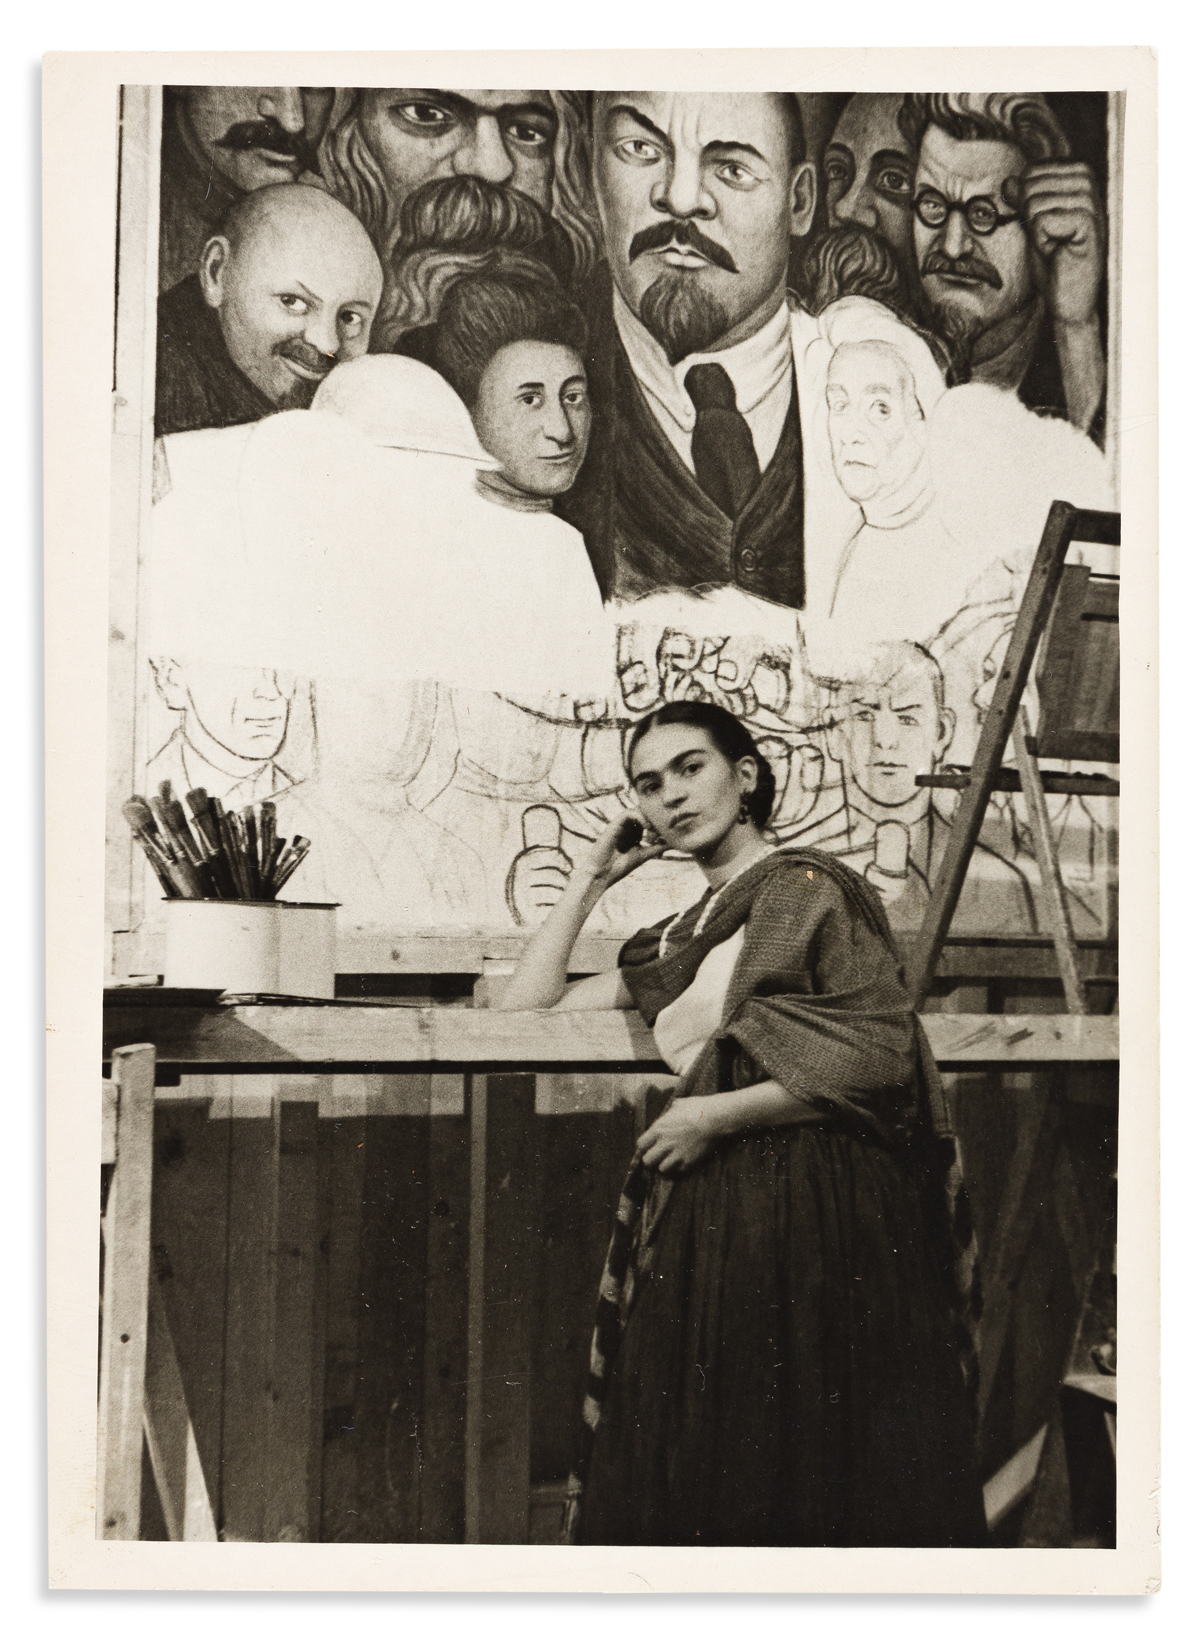 Kahlo, Frida (1907-1954) Photograph by Lucienne Bloch. Portrait, 1933.